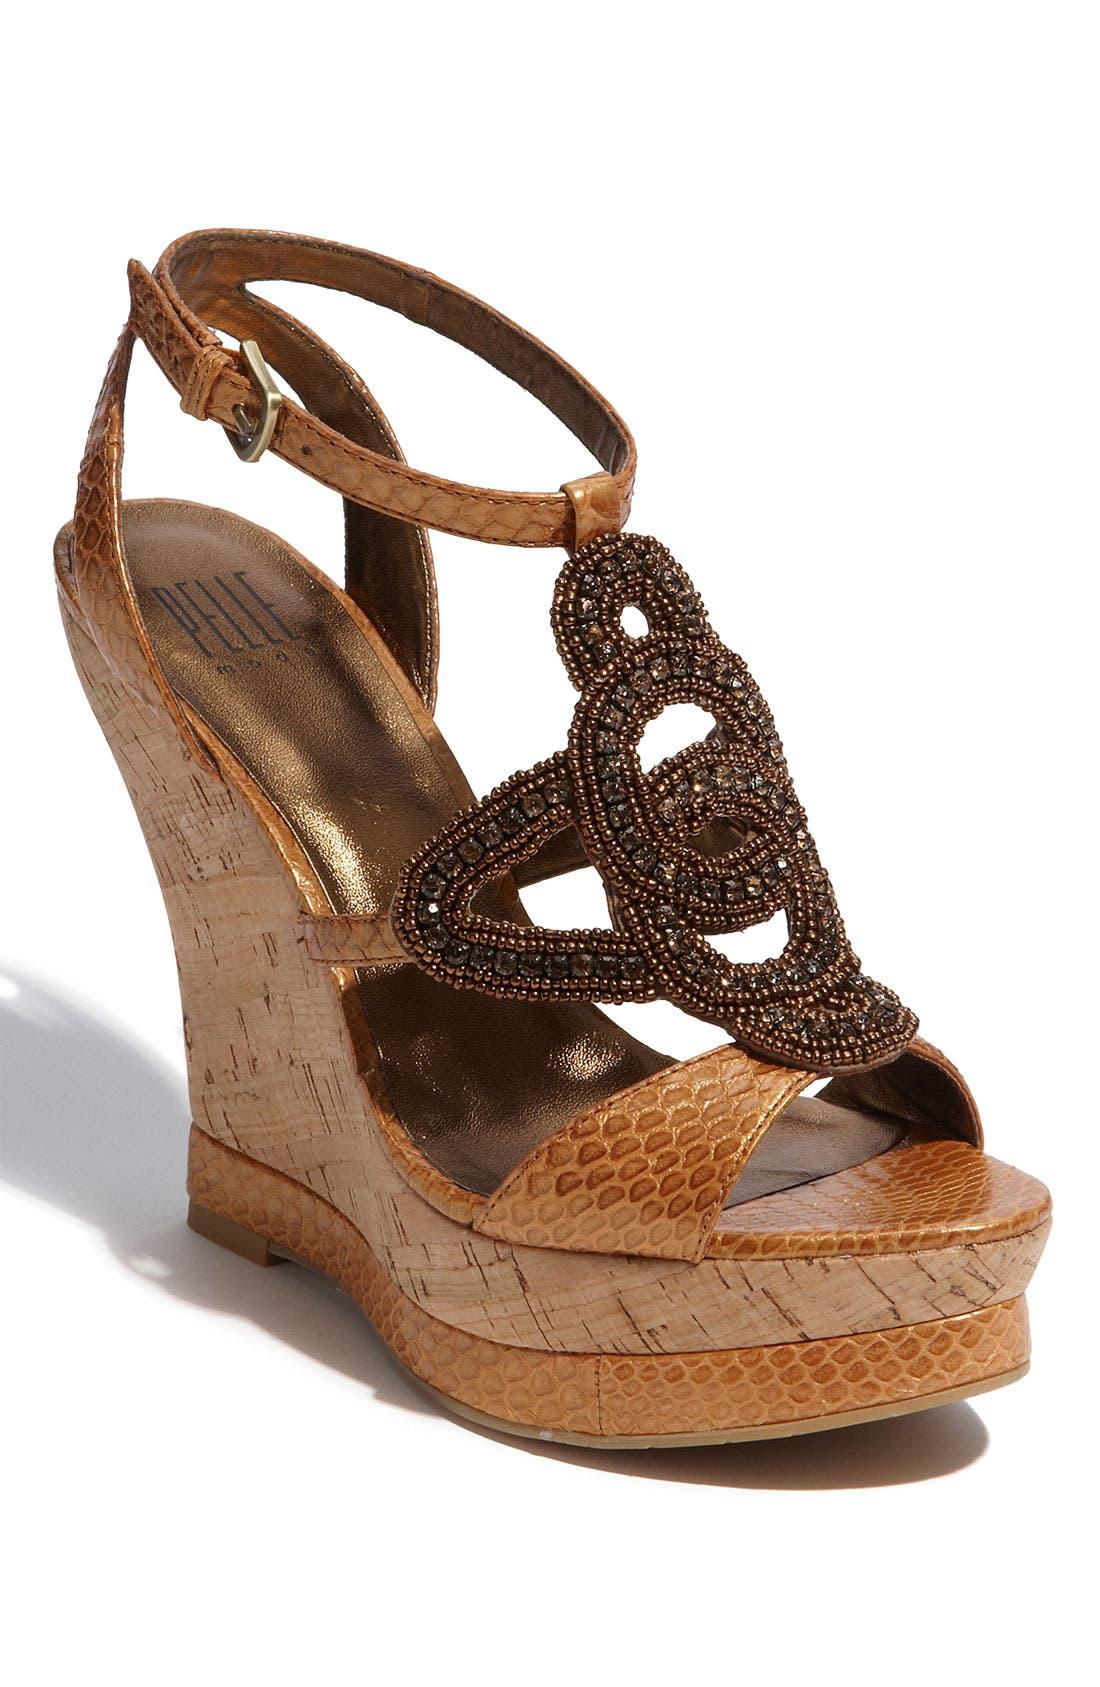 Alternate Image 1 Selected - Pelle Moda 'Niland' Wedge Sandal